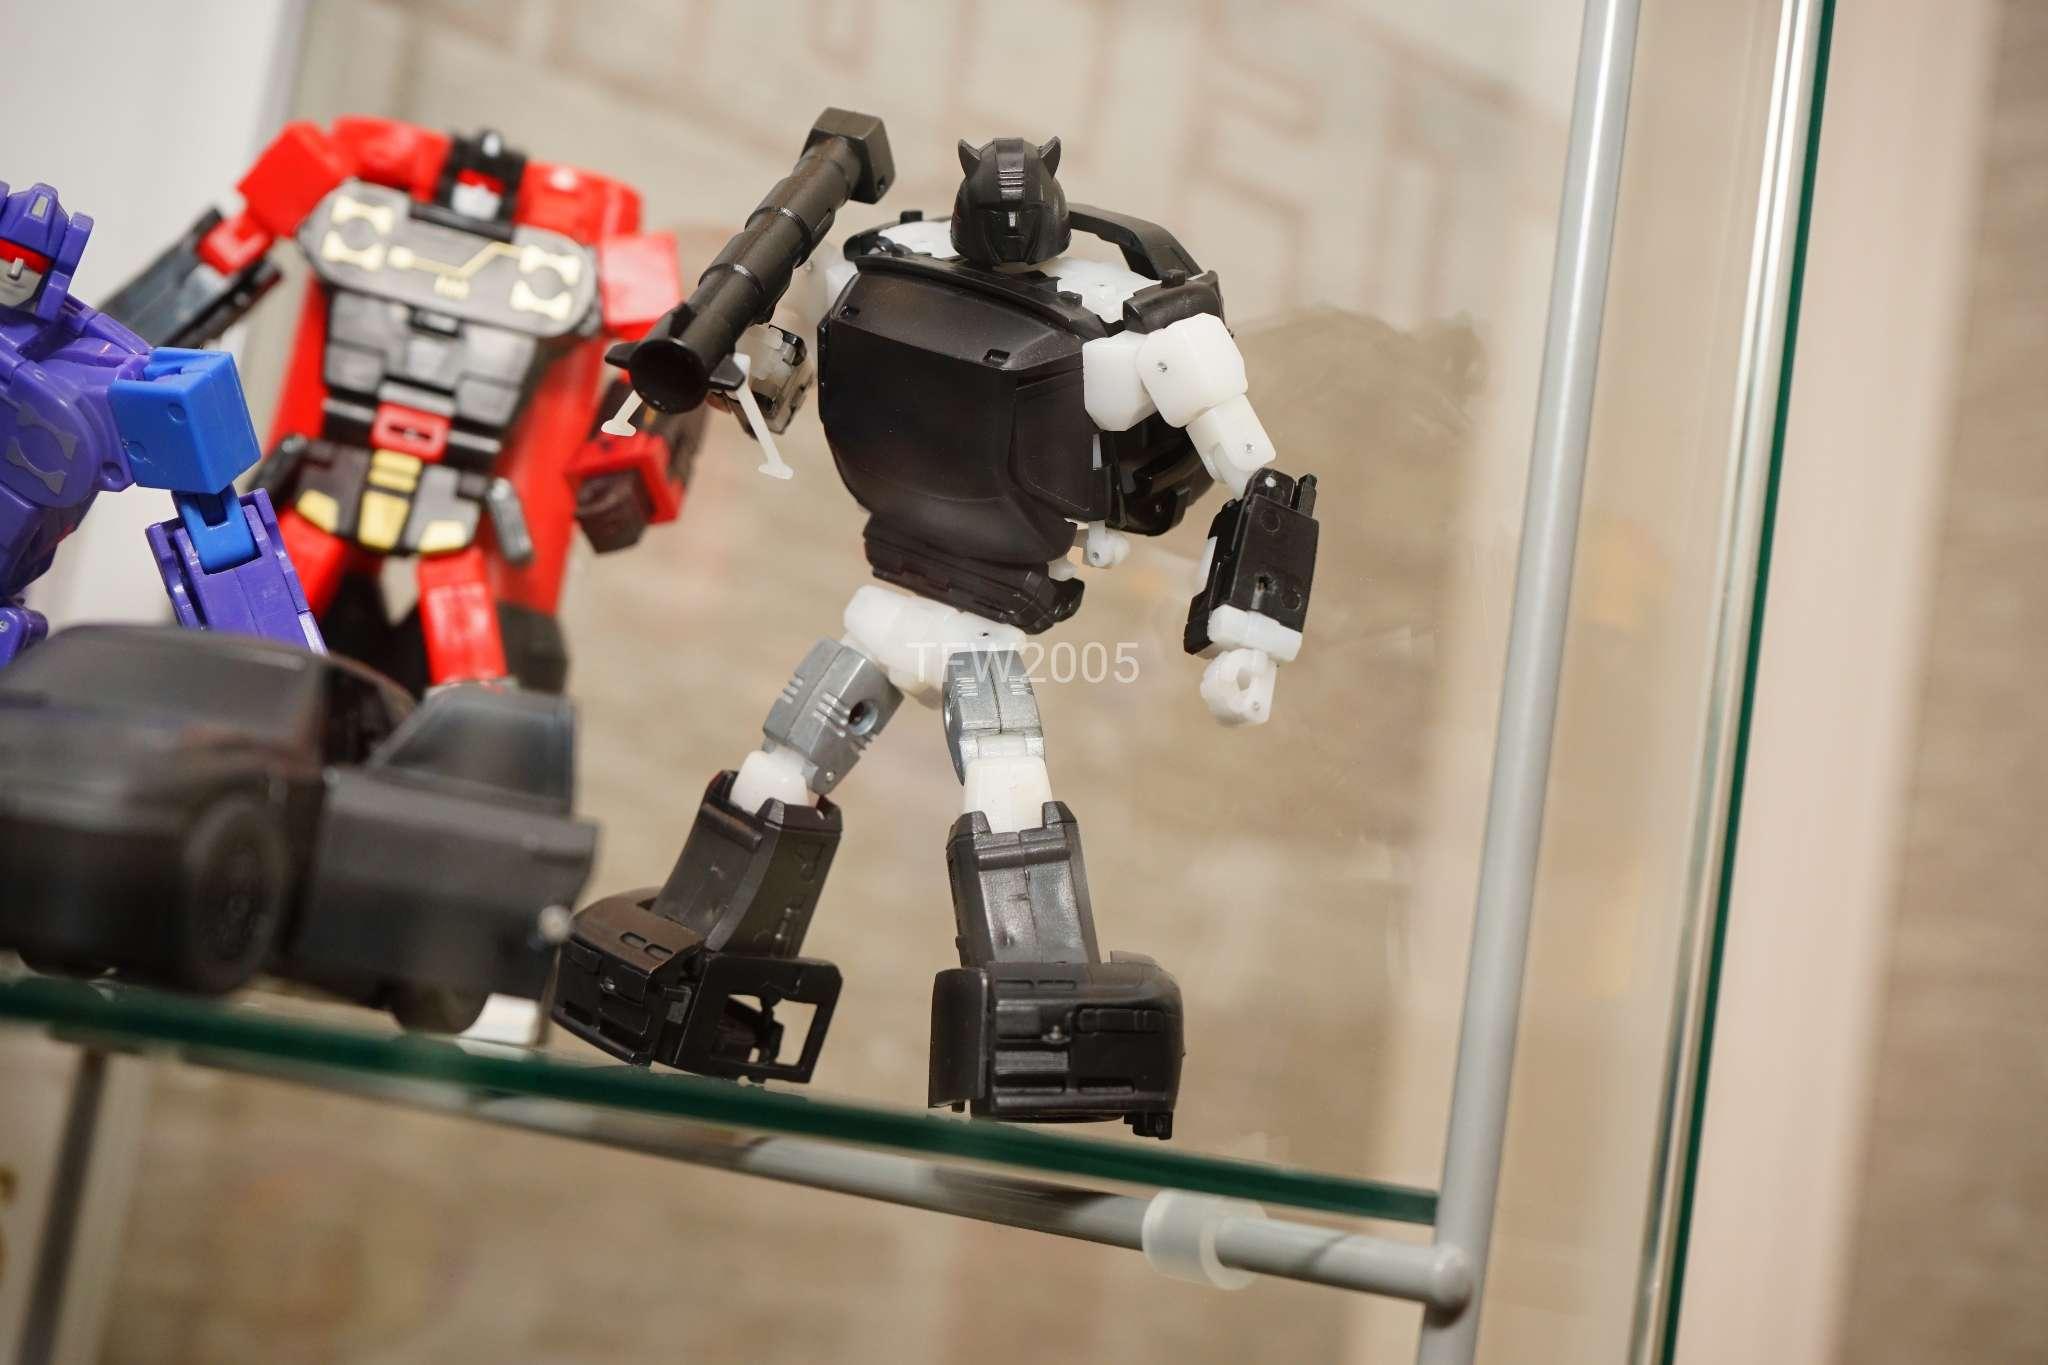 [Ocular Max] Produit Tiers - Minibots MP - PS-09 Hellion (aka Cliffjumper/Matamore), PS-11 Omne - (aka Cosmos) XZDLfqHB_o